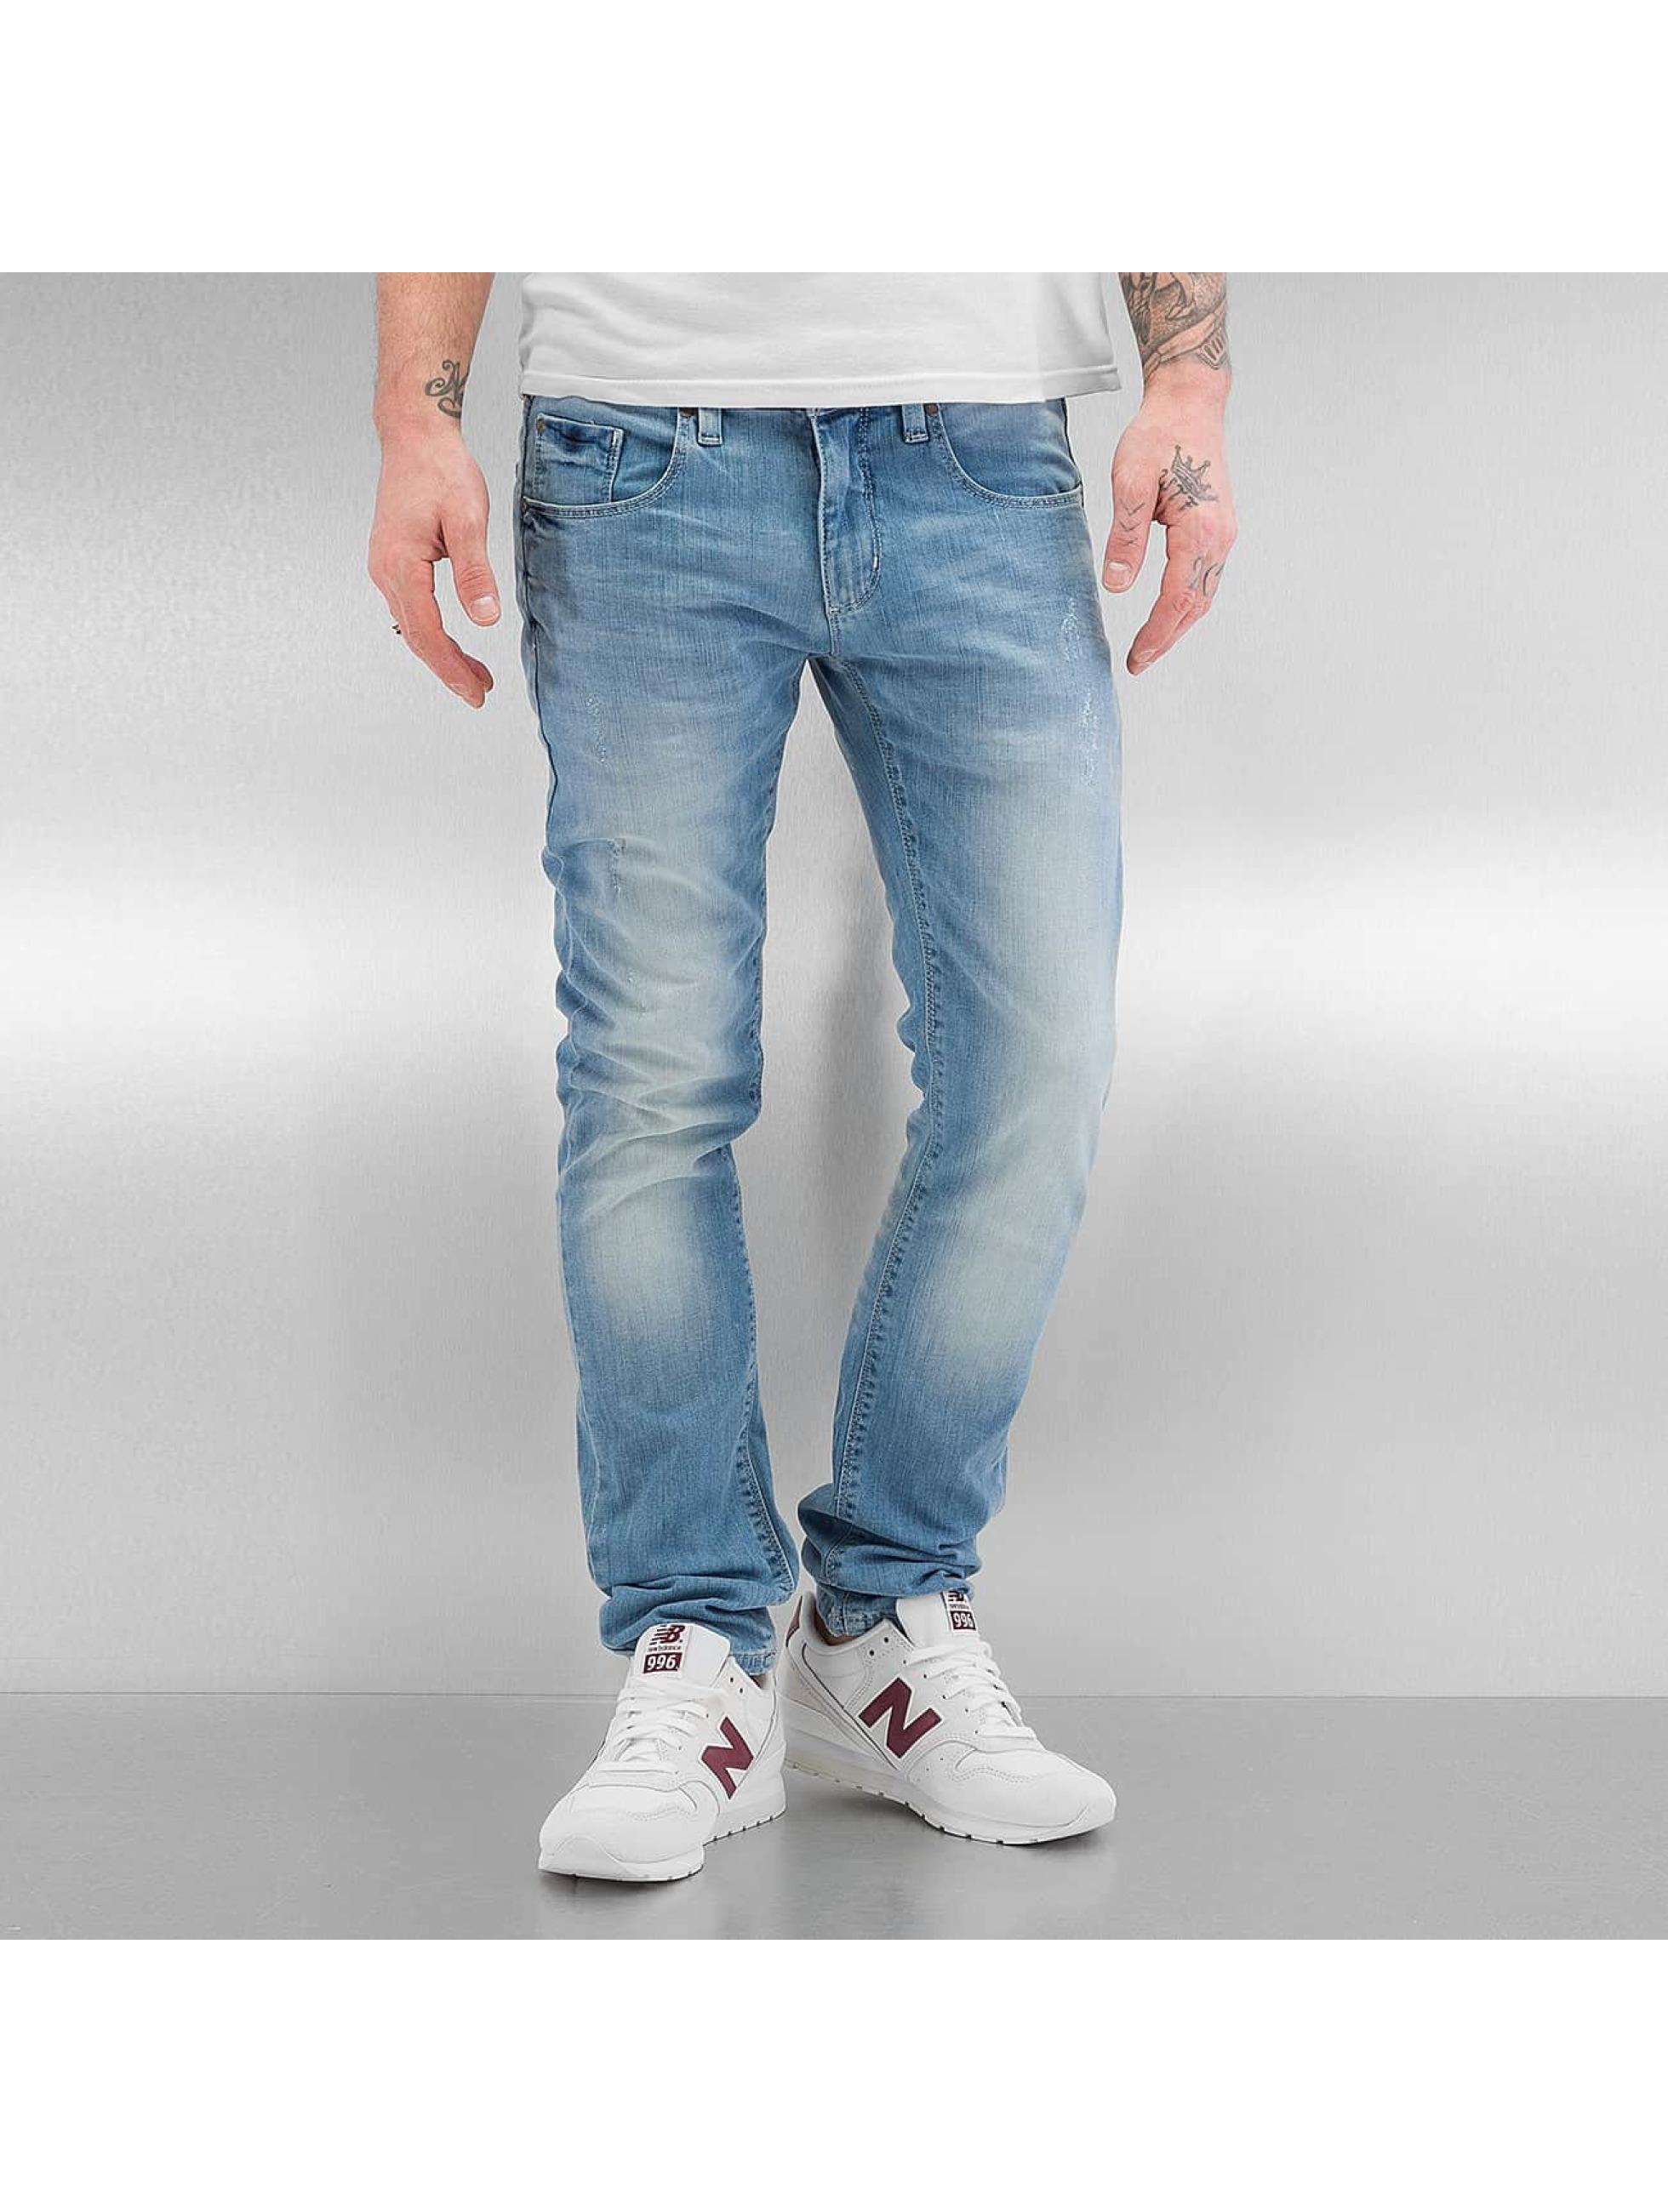 SHINE Original Woody Slim Fit bleu Jean skinny homme